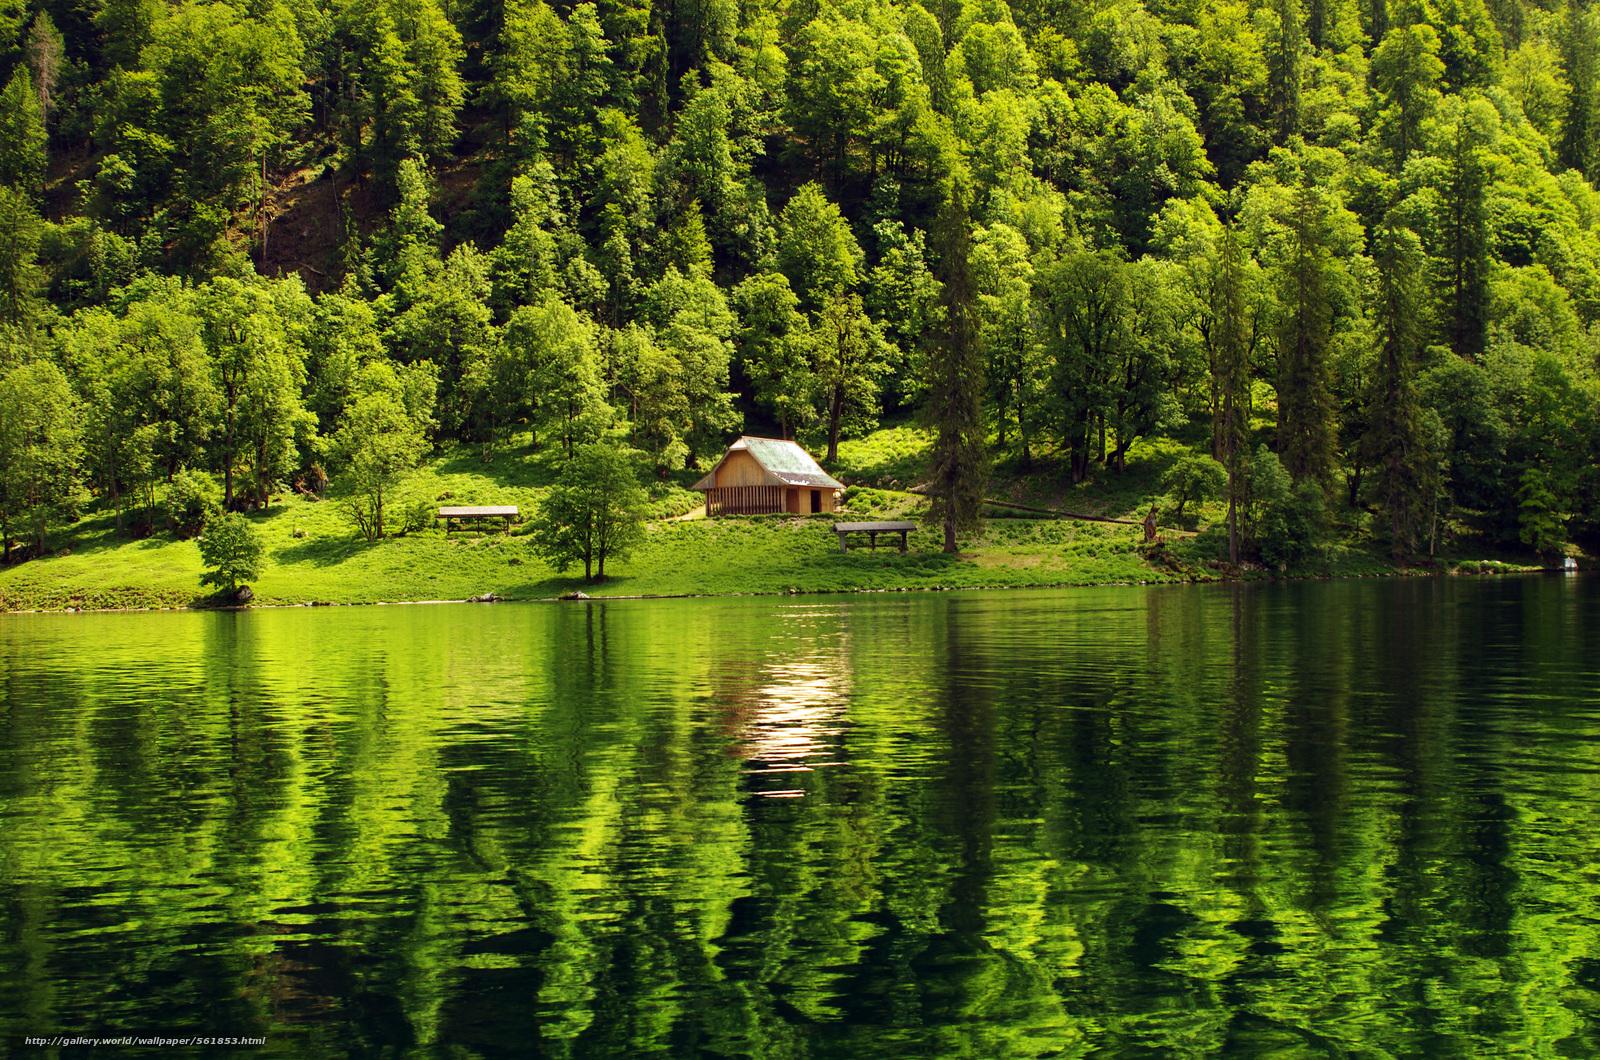 wallpaper forest lake cabin landscape desktop wallpaper 1600x1060